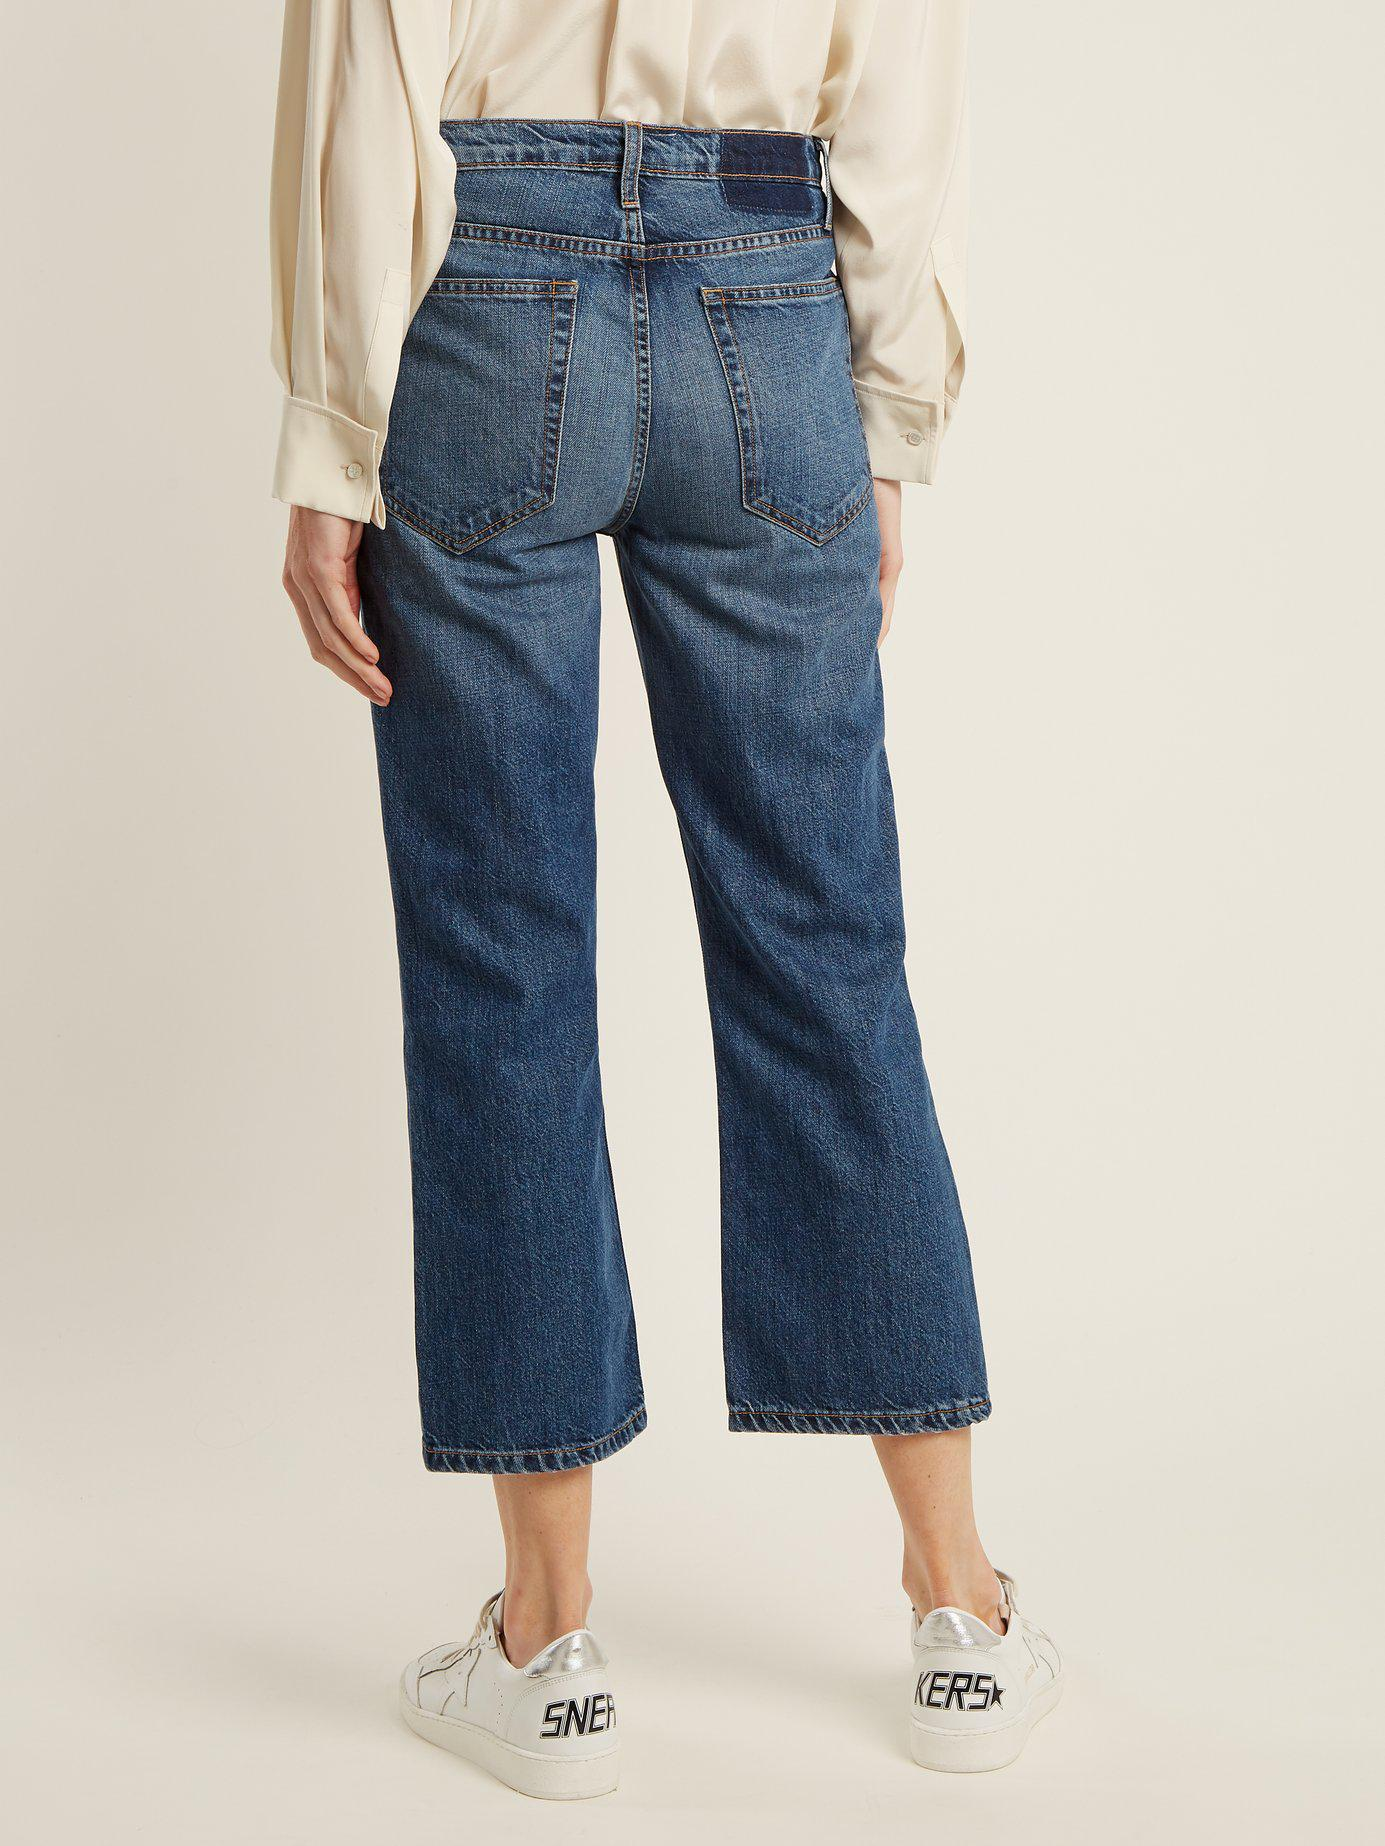 The Great Jean évasé taille mi-haute The Relaxed Nerd j5Q27Po5U9